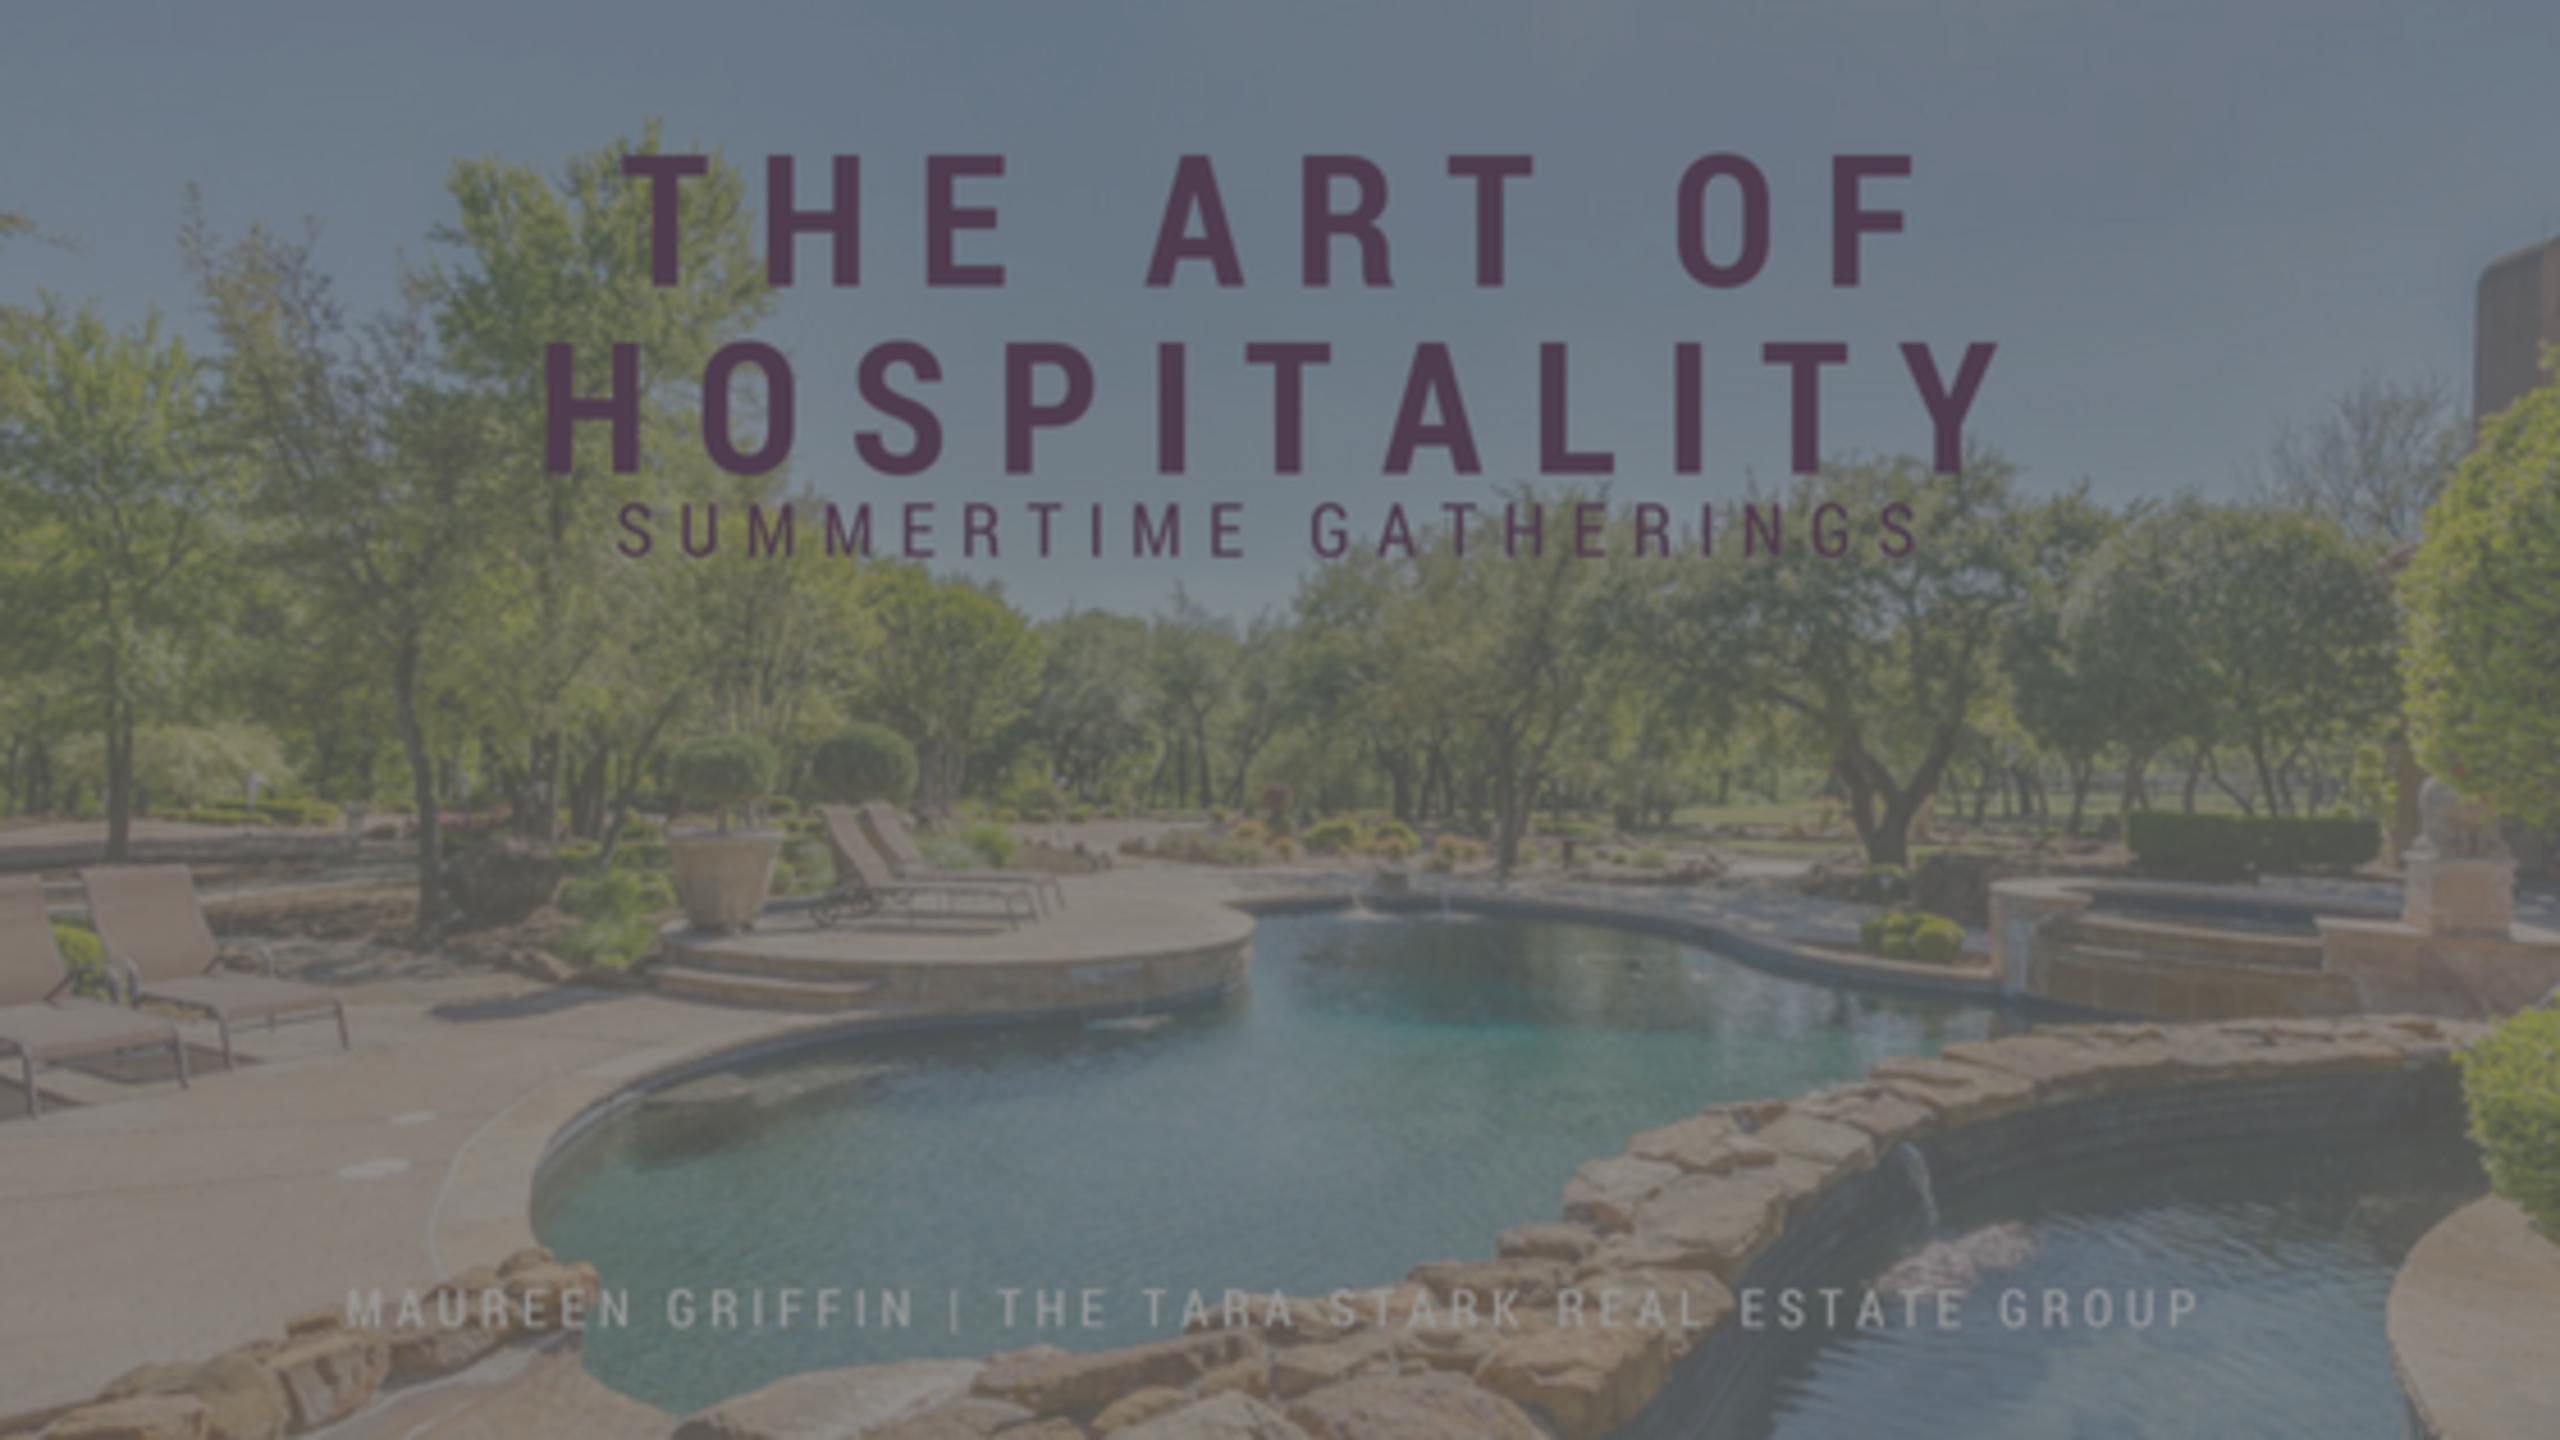 The Art of Hospitality : Summertime Gatherings